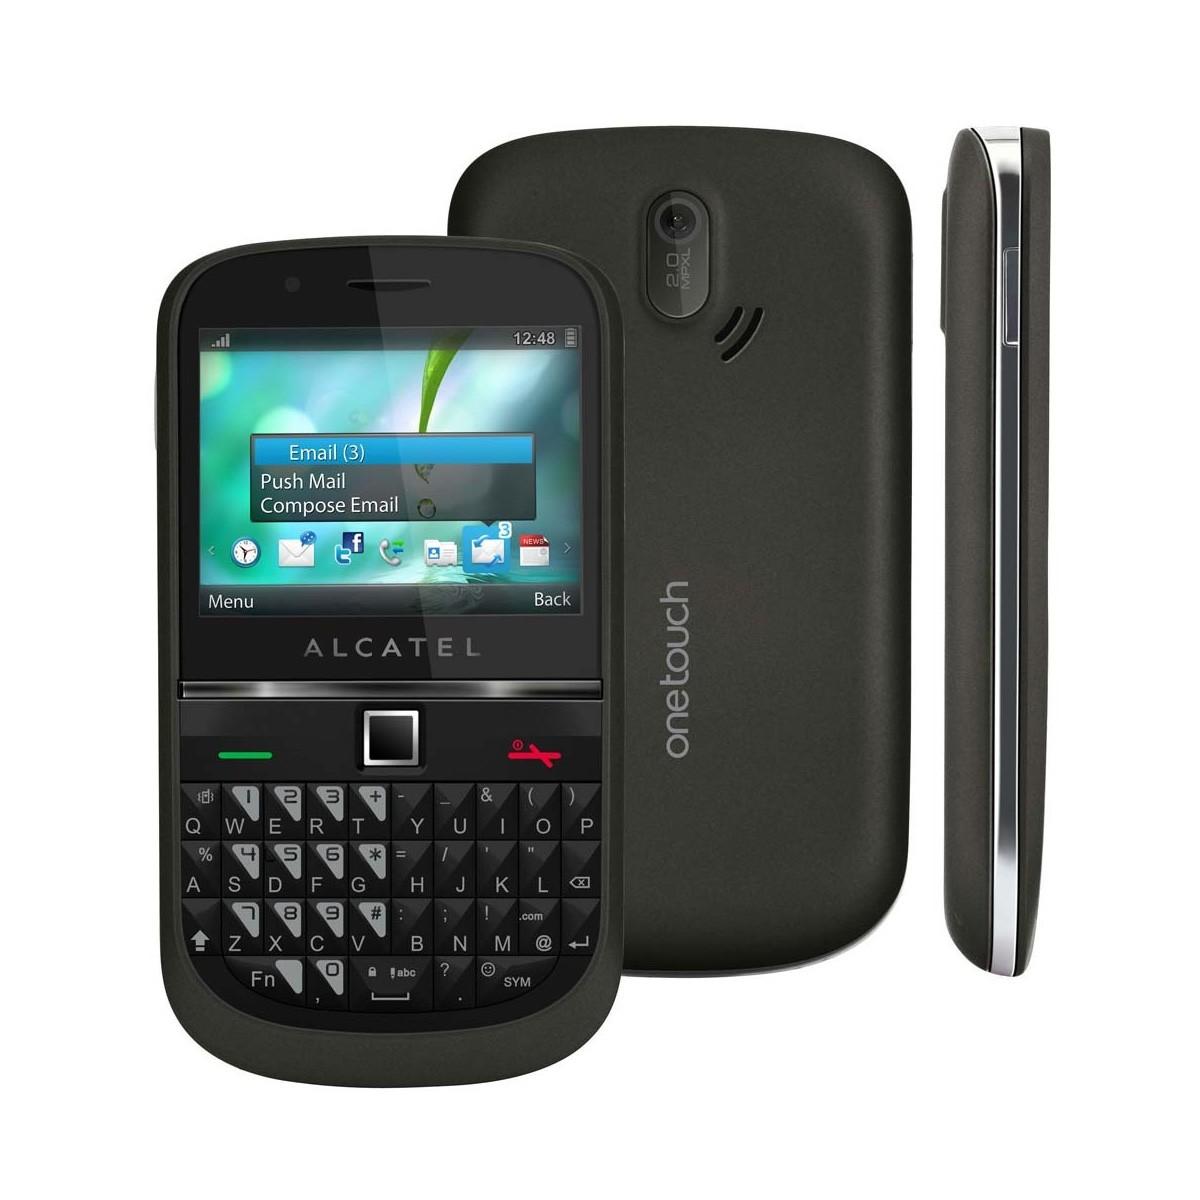 Celular Básico Alcatel OT900 3G Qwerty Mp3 Radio Fm (Usado)